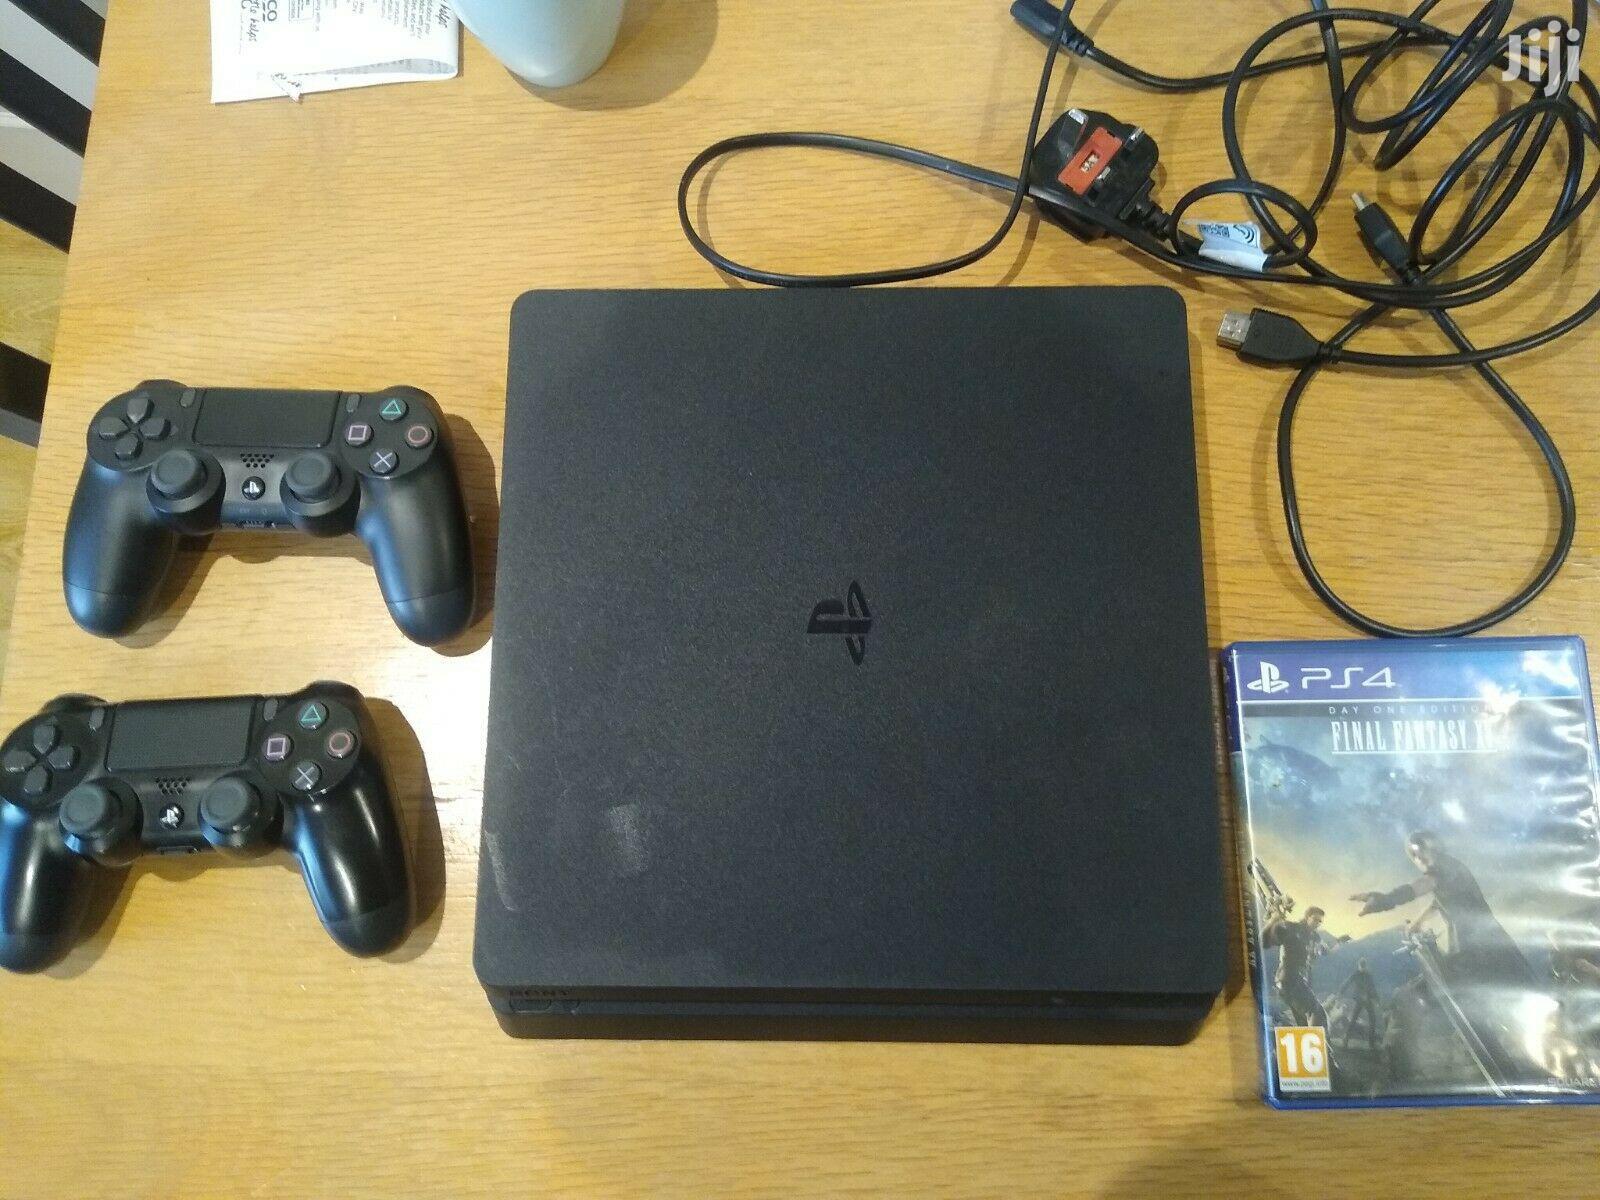 Archive: Sony Playstation 4 Slim 500GB Console - Matte Black